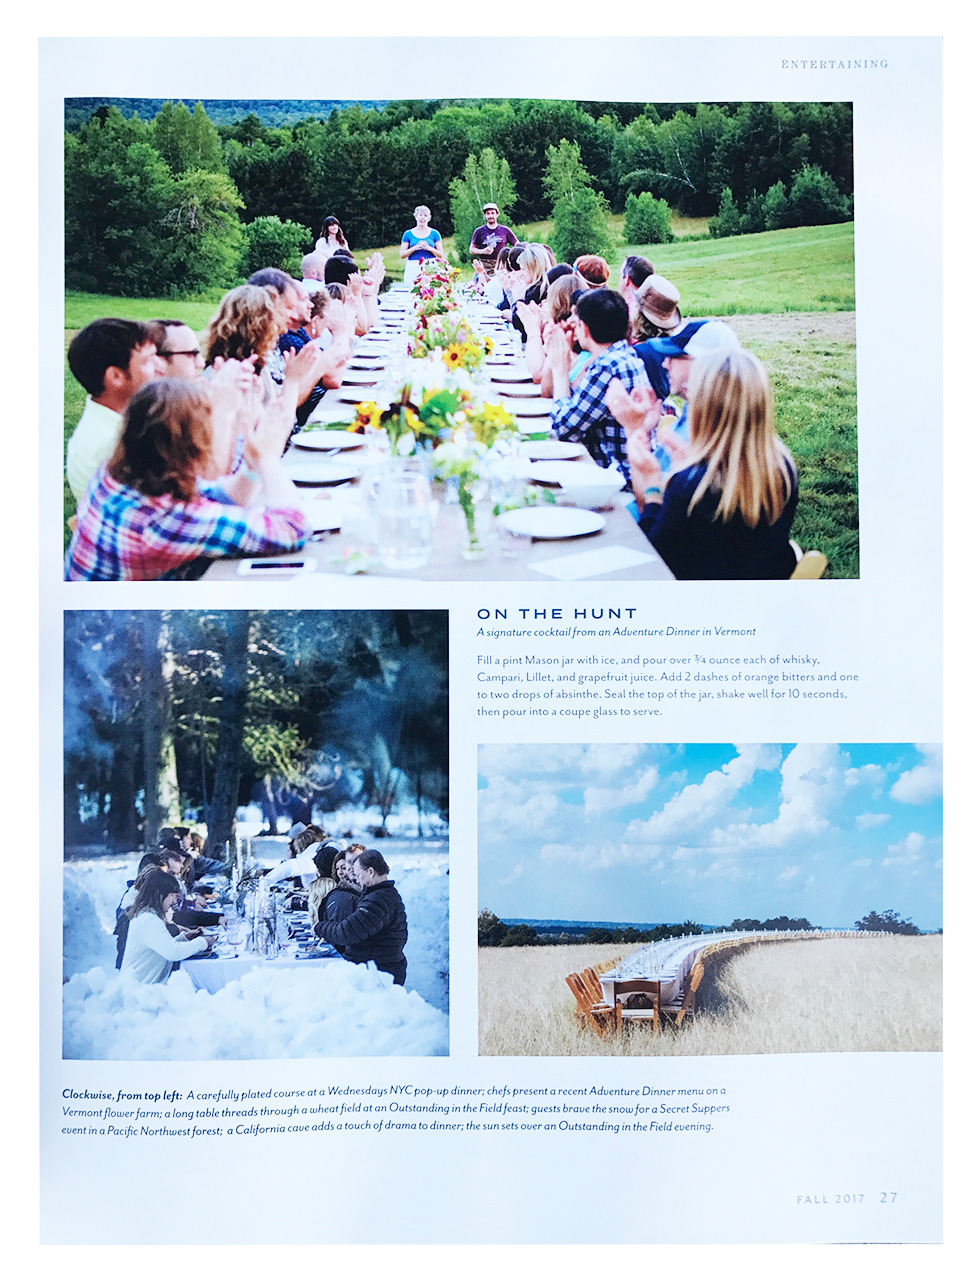 Stitchdown Farm Adventure Dinner Sift Magazine Fall 2017